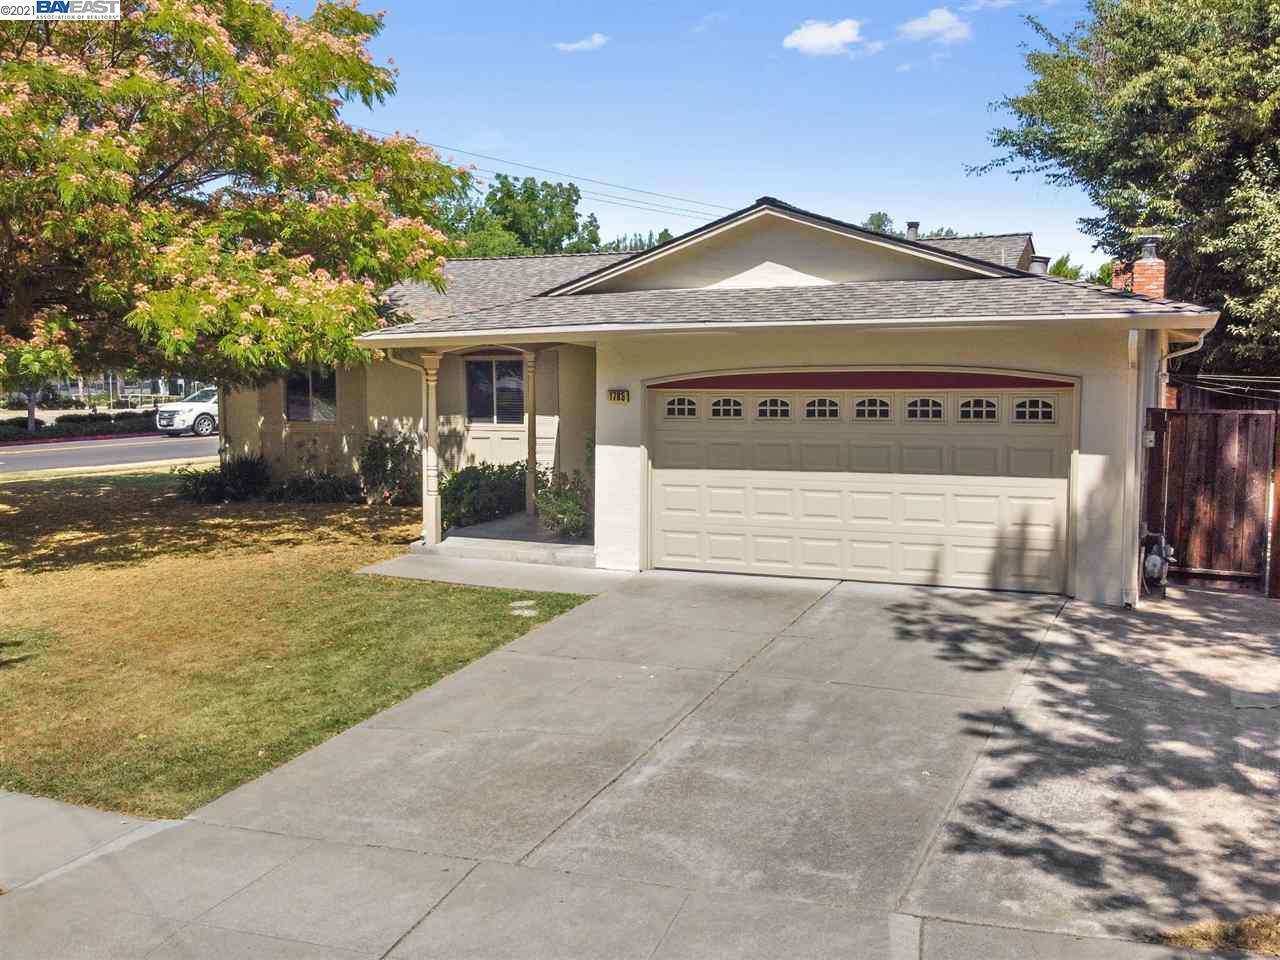 1785 Harvest Rd, PLEASANTON, CA 94566